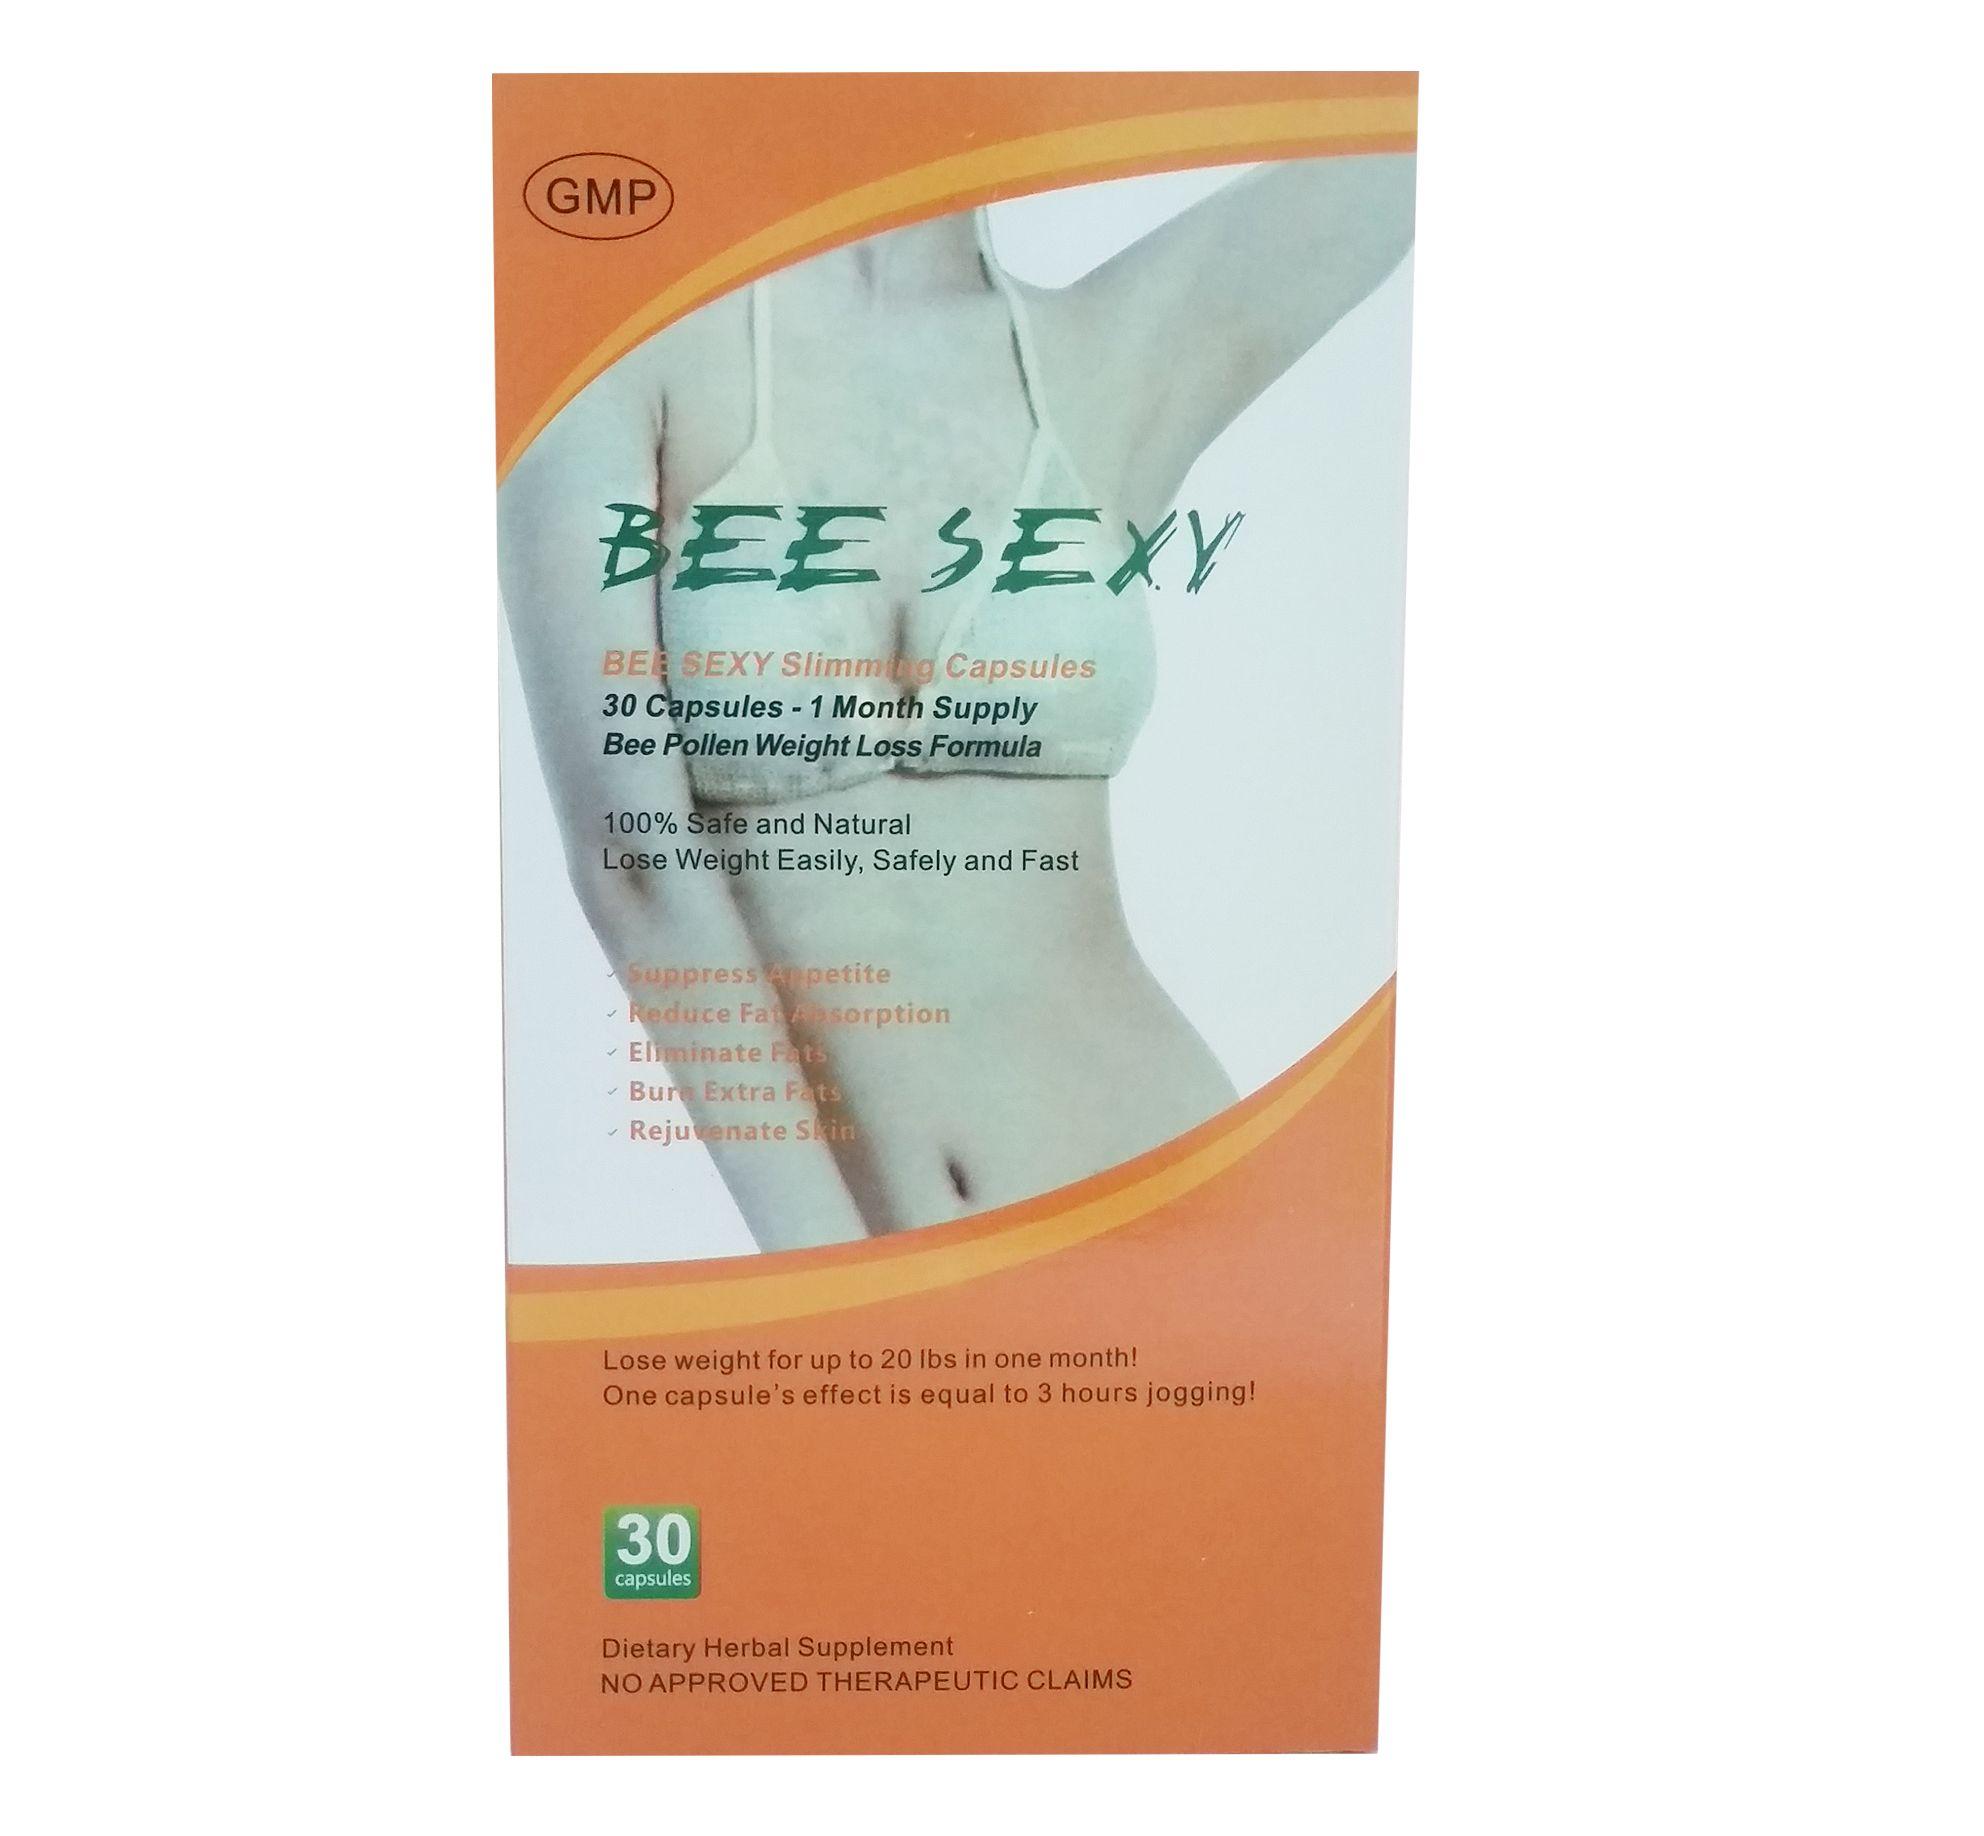 Bee sexy slimming capsule